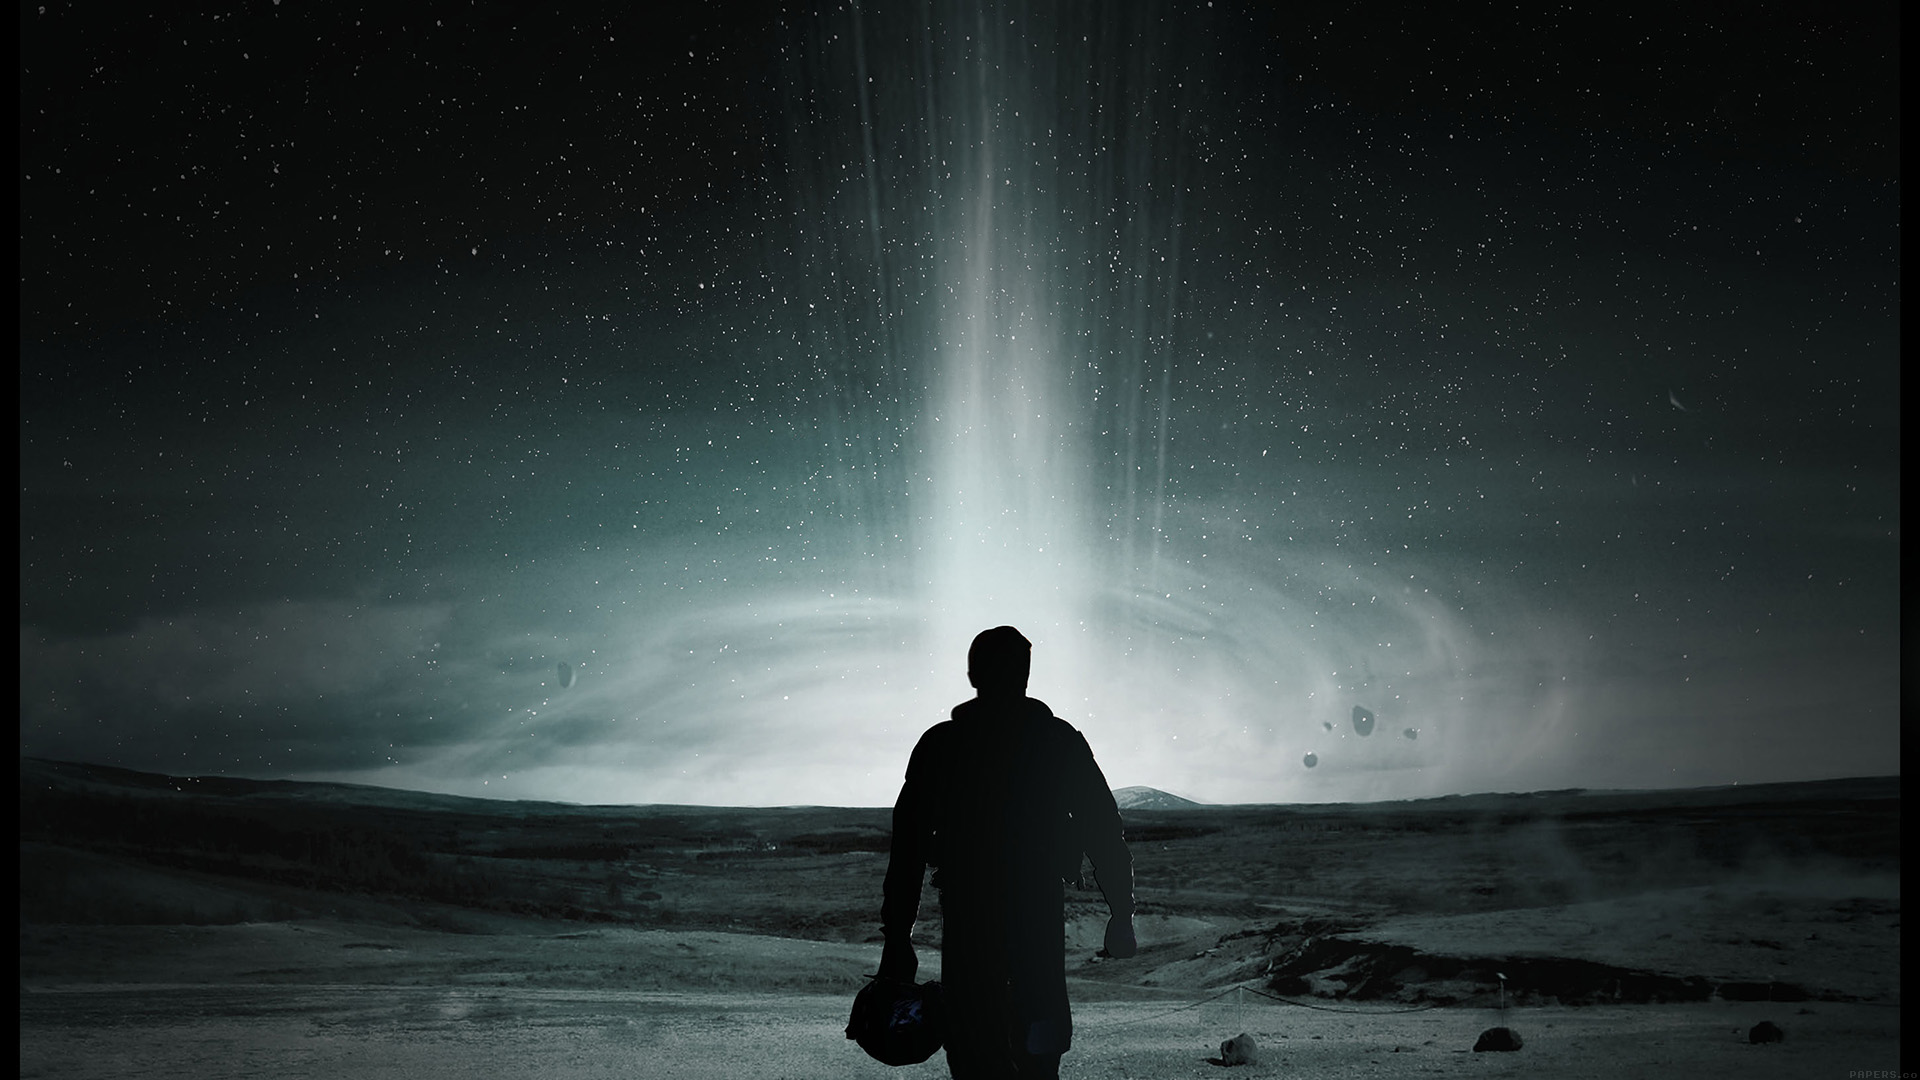 Summer Fall Desktop Wallpaper Hc86 Matthew Mcconaughey Interstellar Space Filme Papers Co